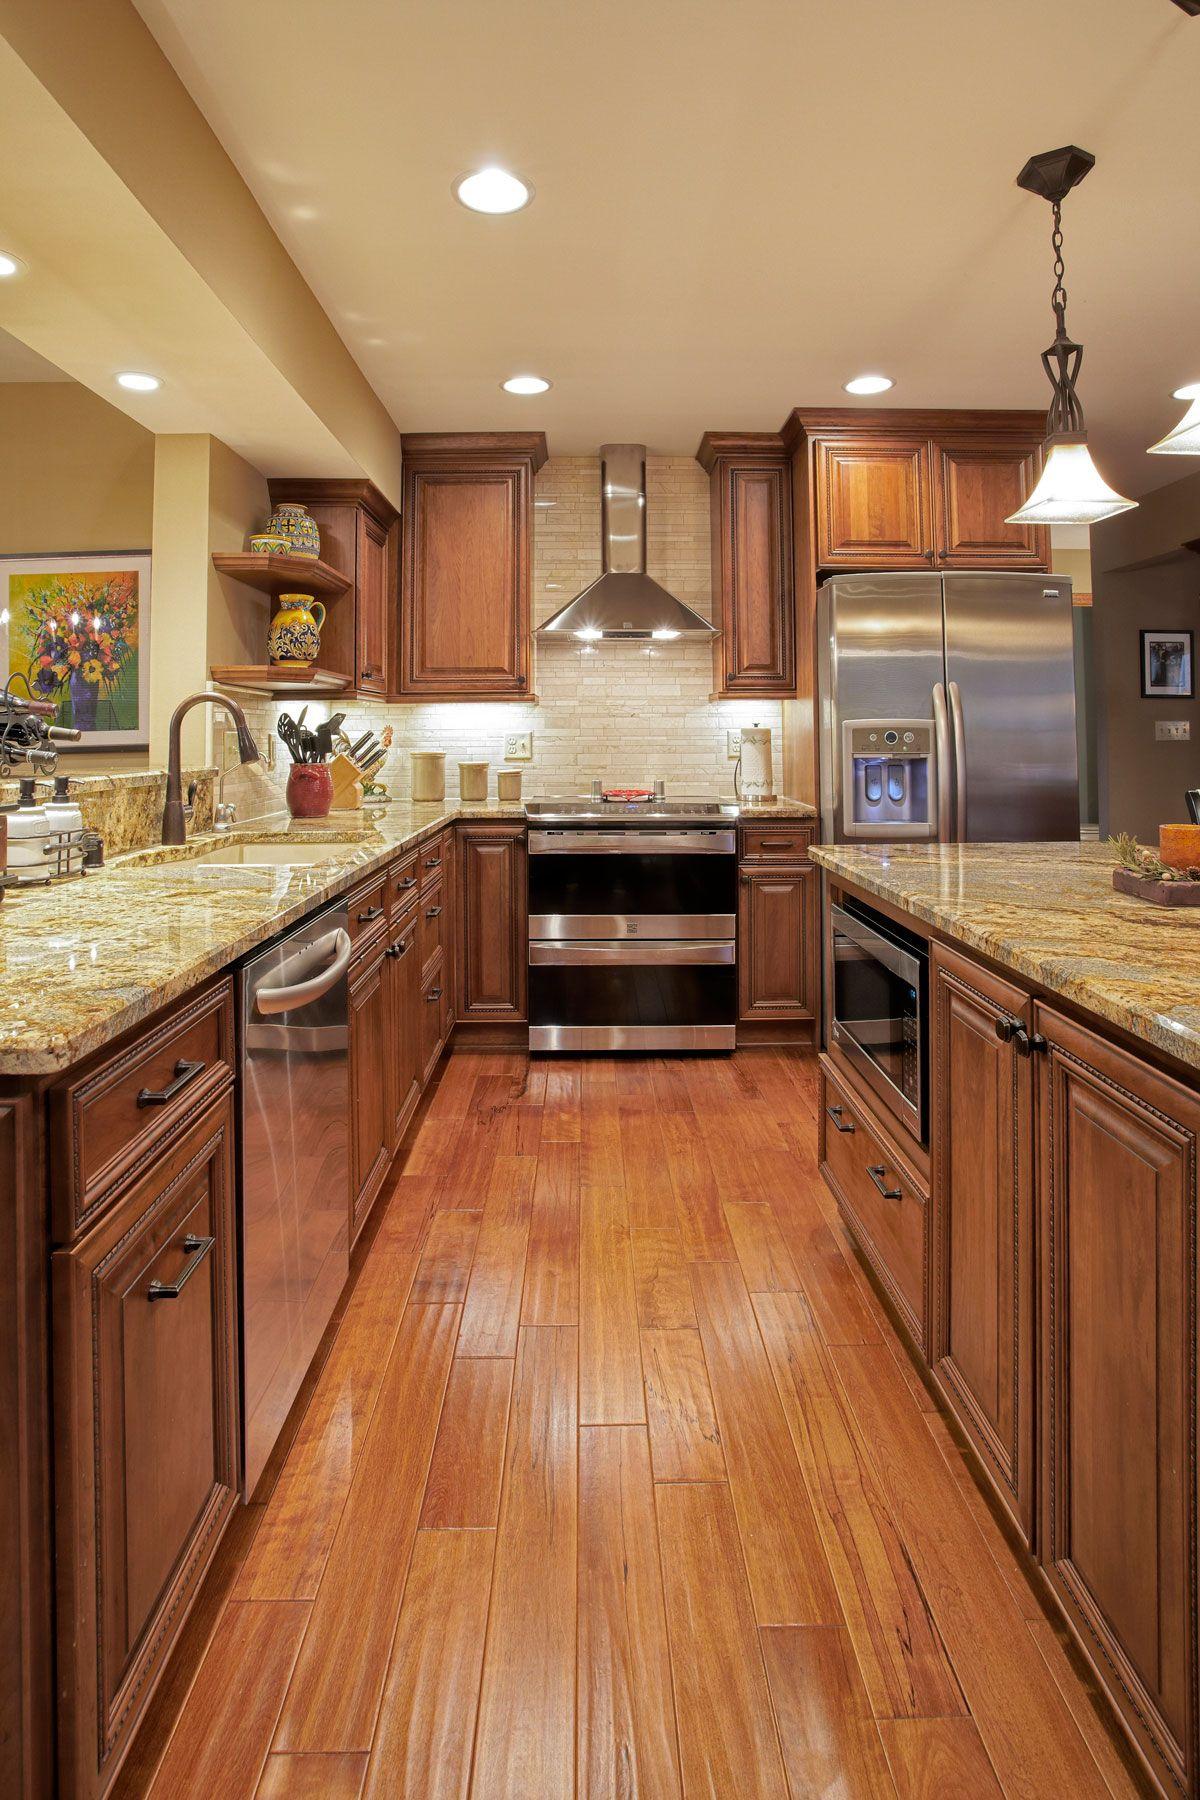 small kitchen design with cherry wood cabinets | kitchen | pinterest